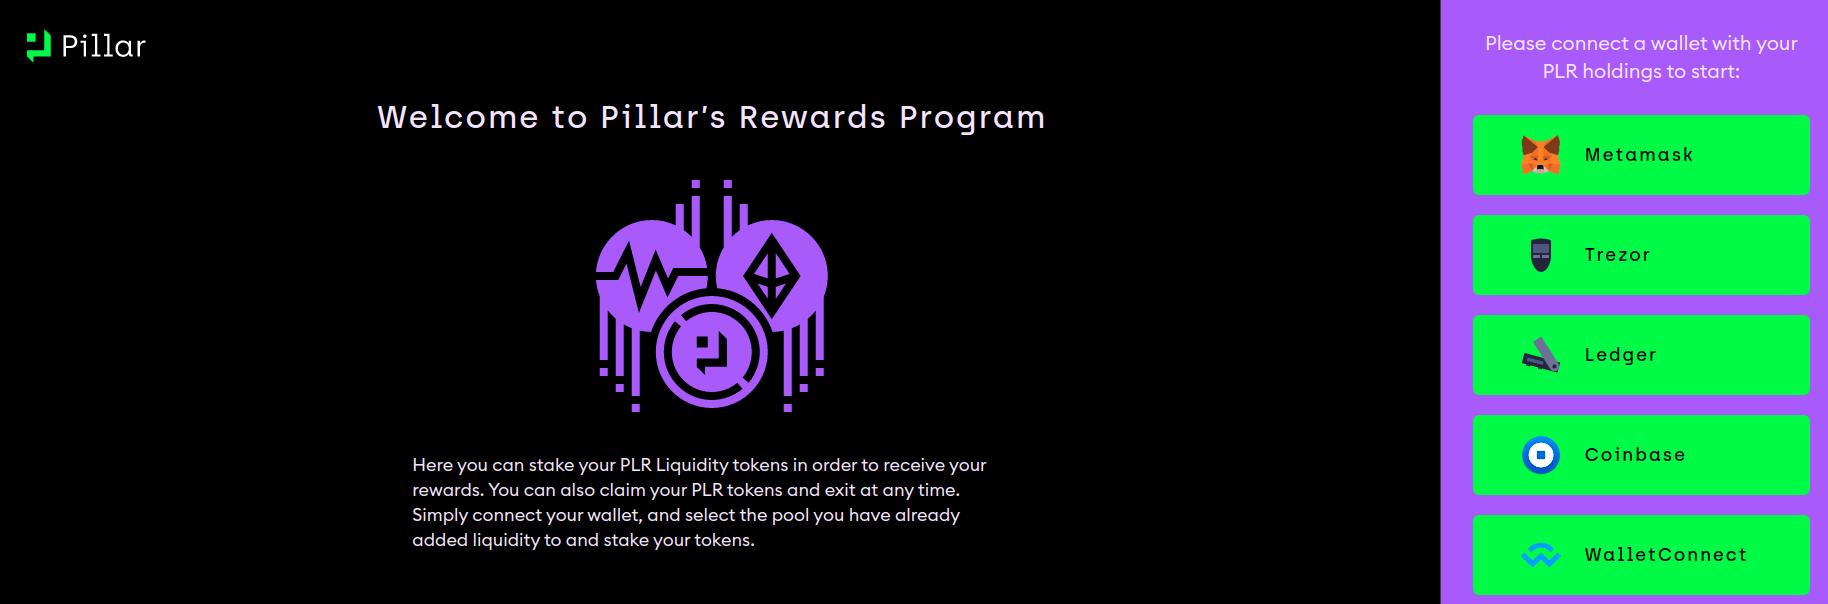 PLR rewards program is live